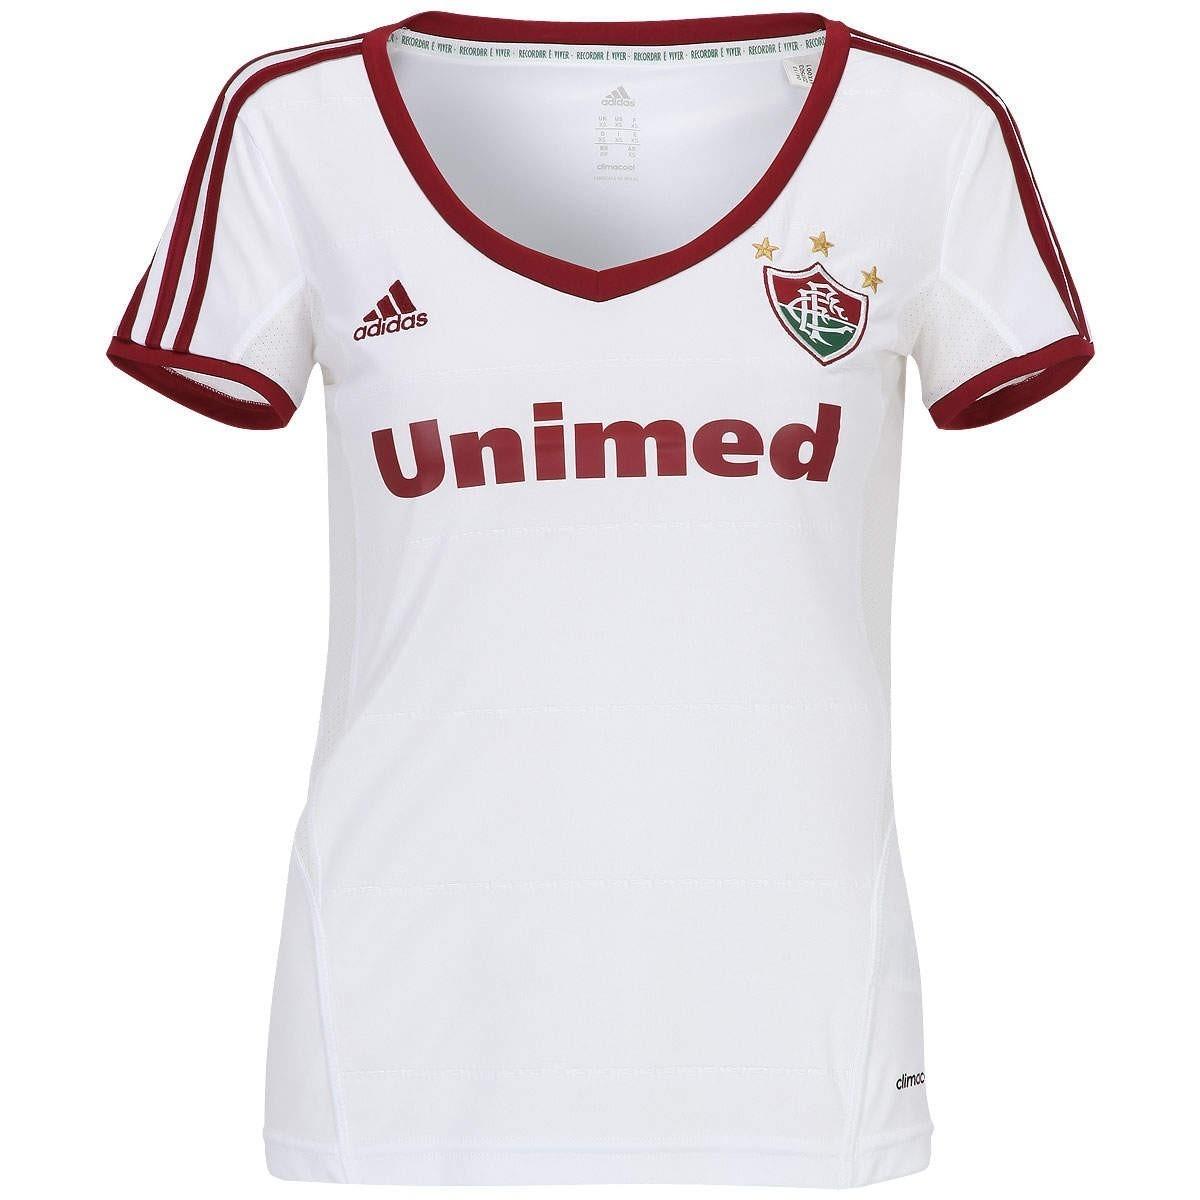 camisa adidas fluminense feminina 2013. Carregando zoom. aca420c70d798